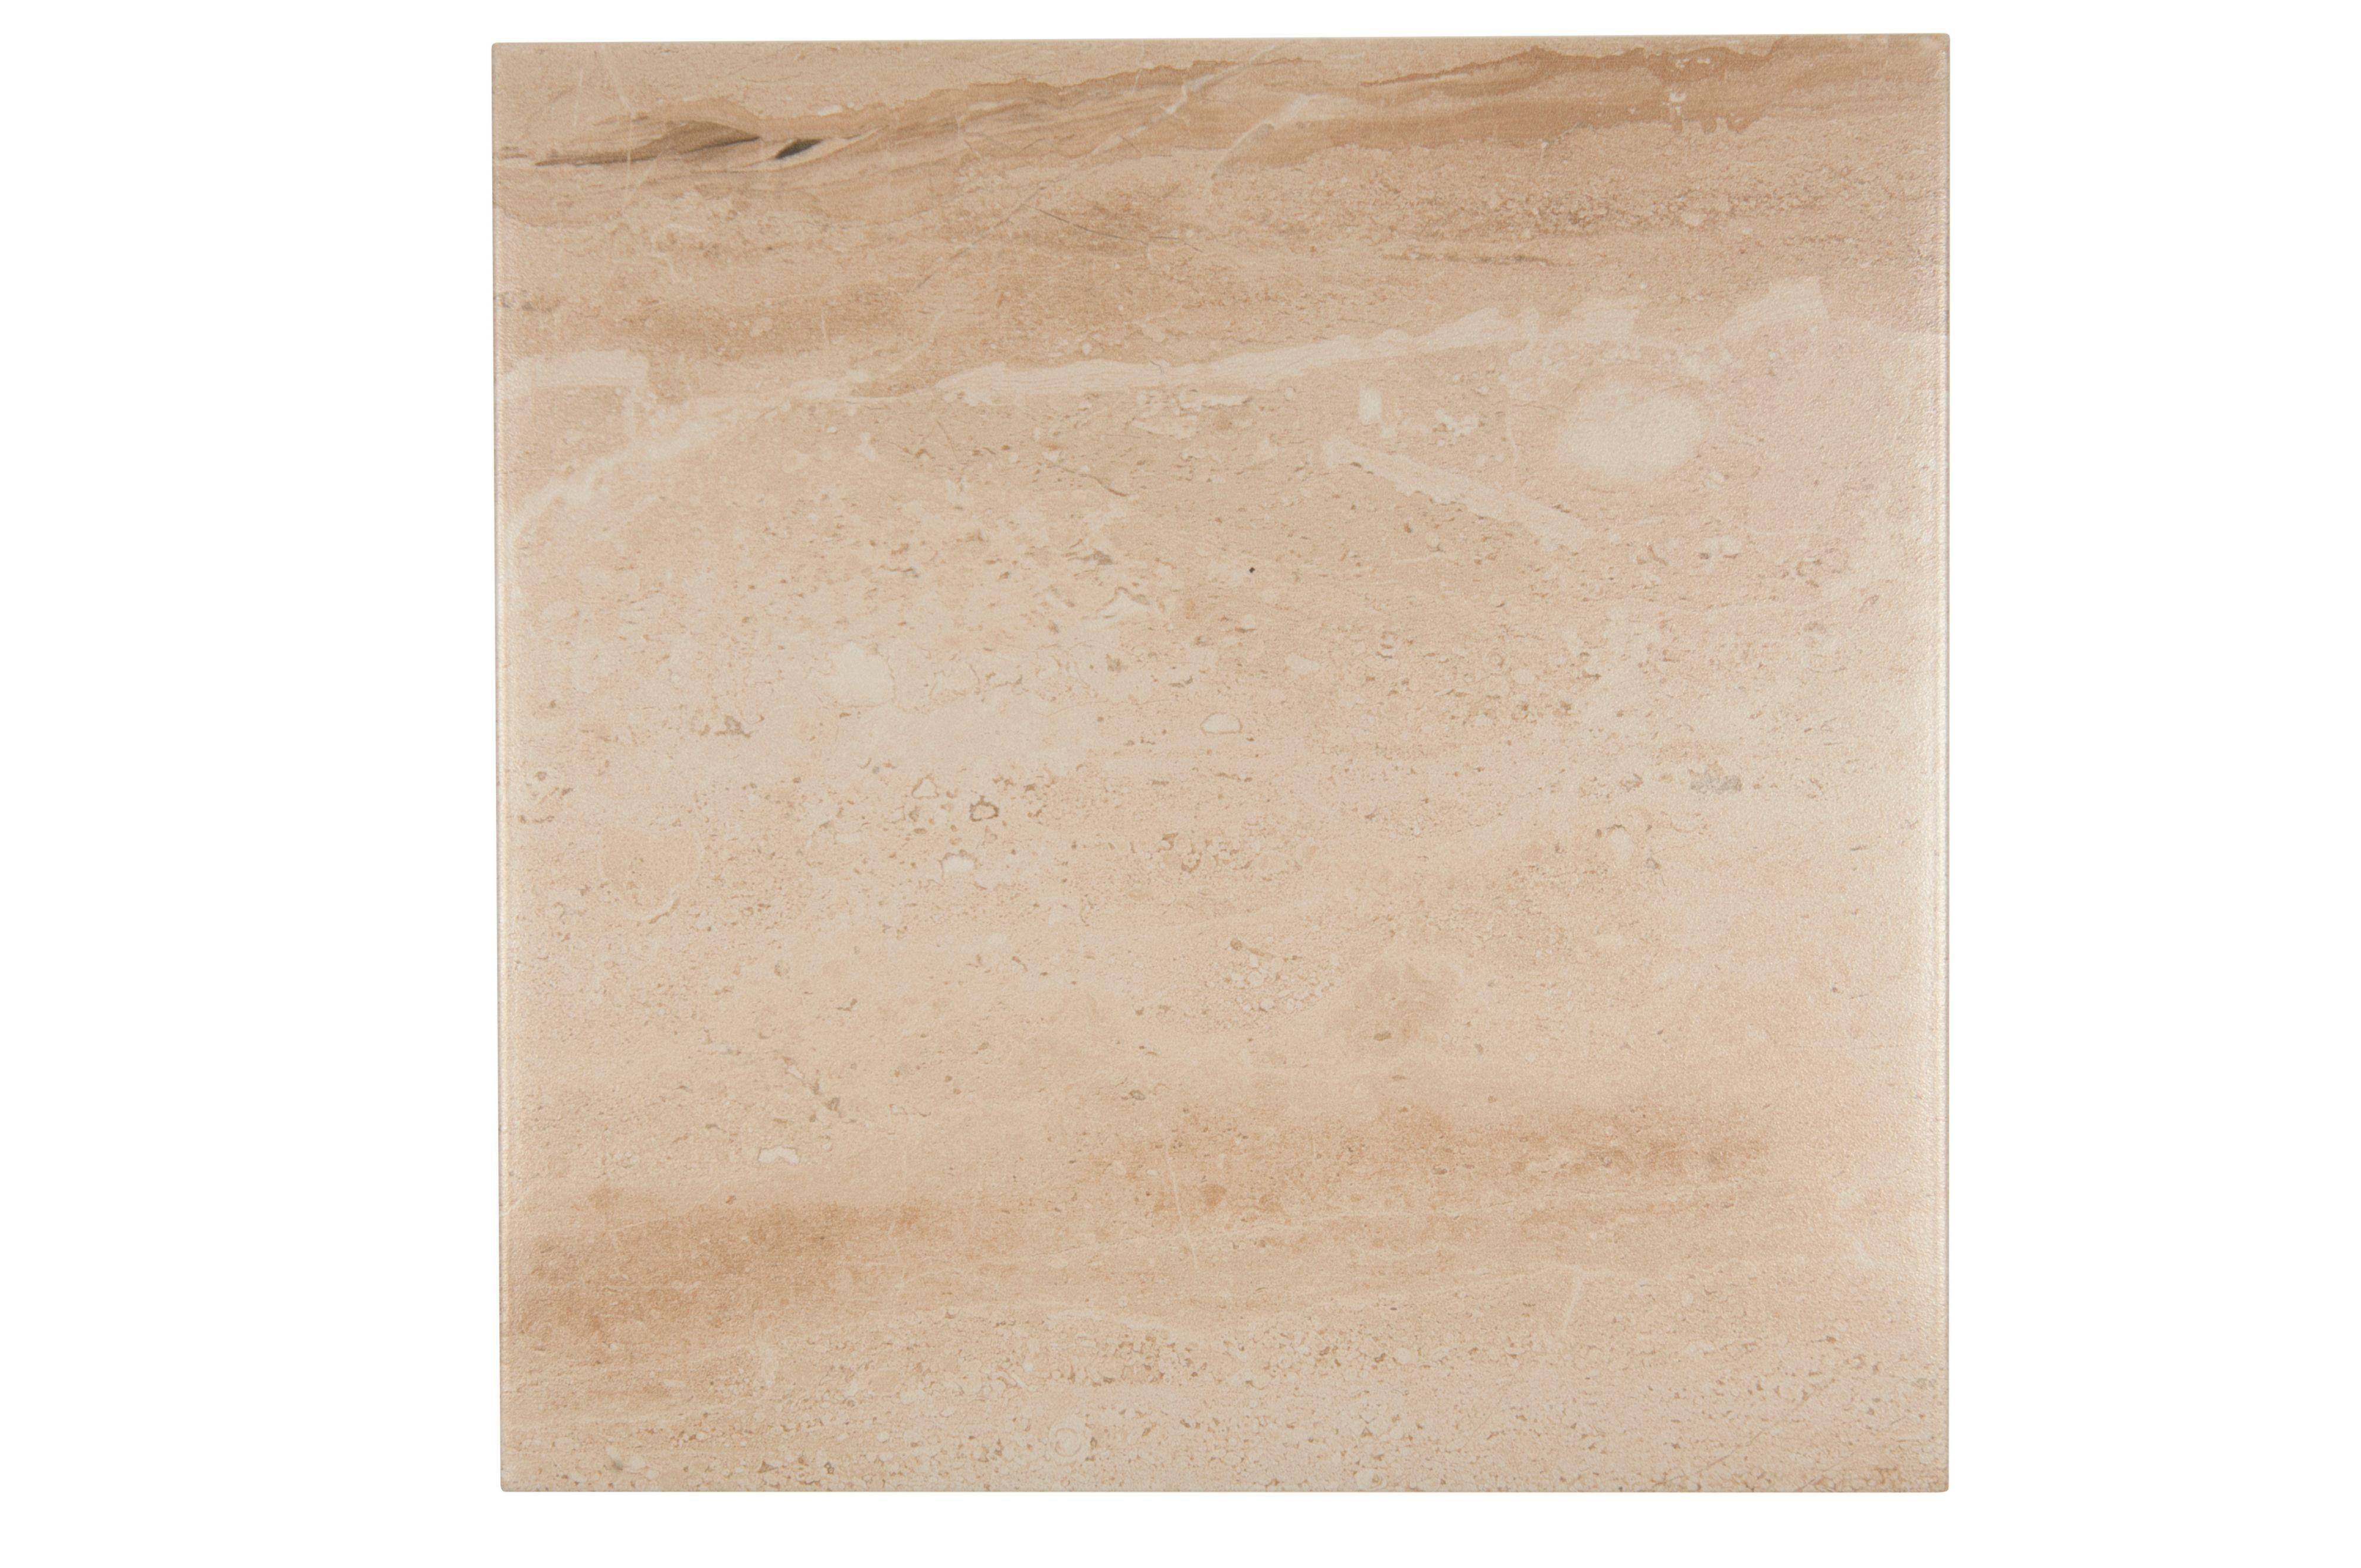 Bali Beige Stone Effect Porcelain Floor Tile, Pack Of 9, (l)333mm (w)333mm